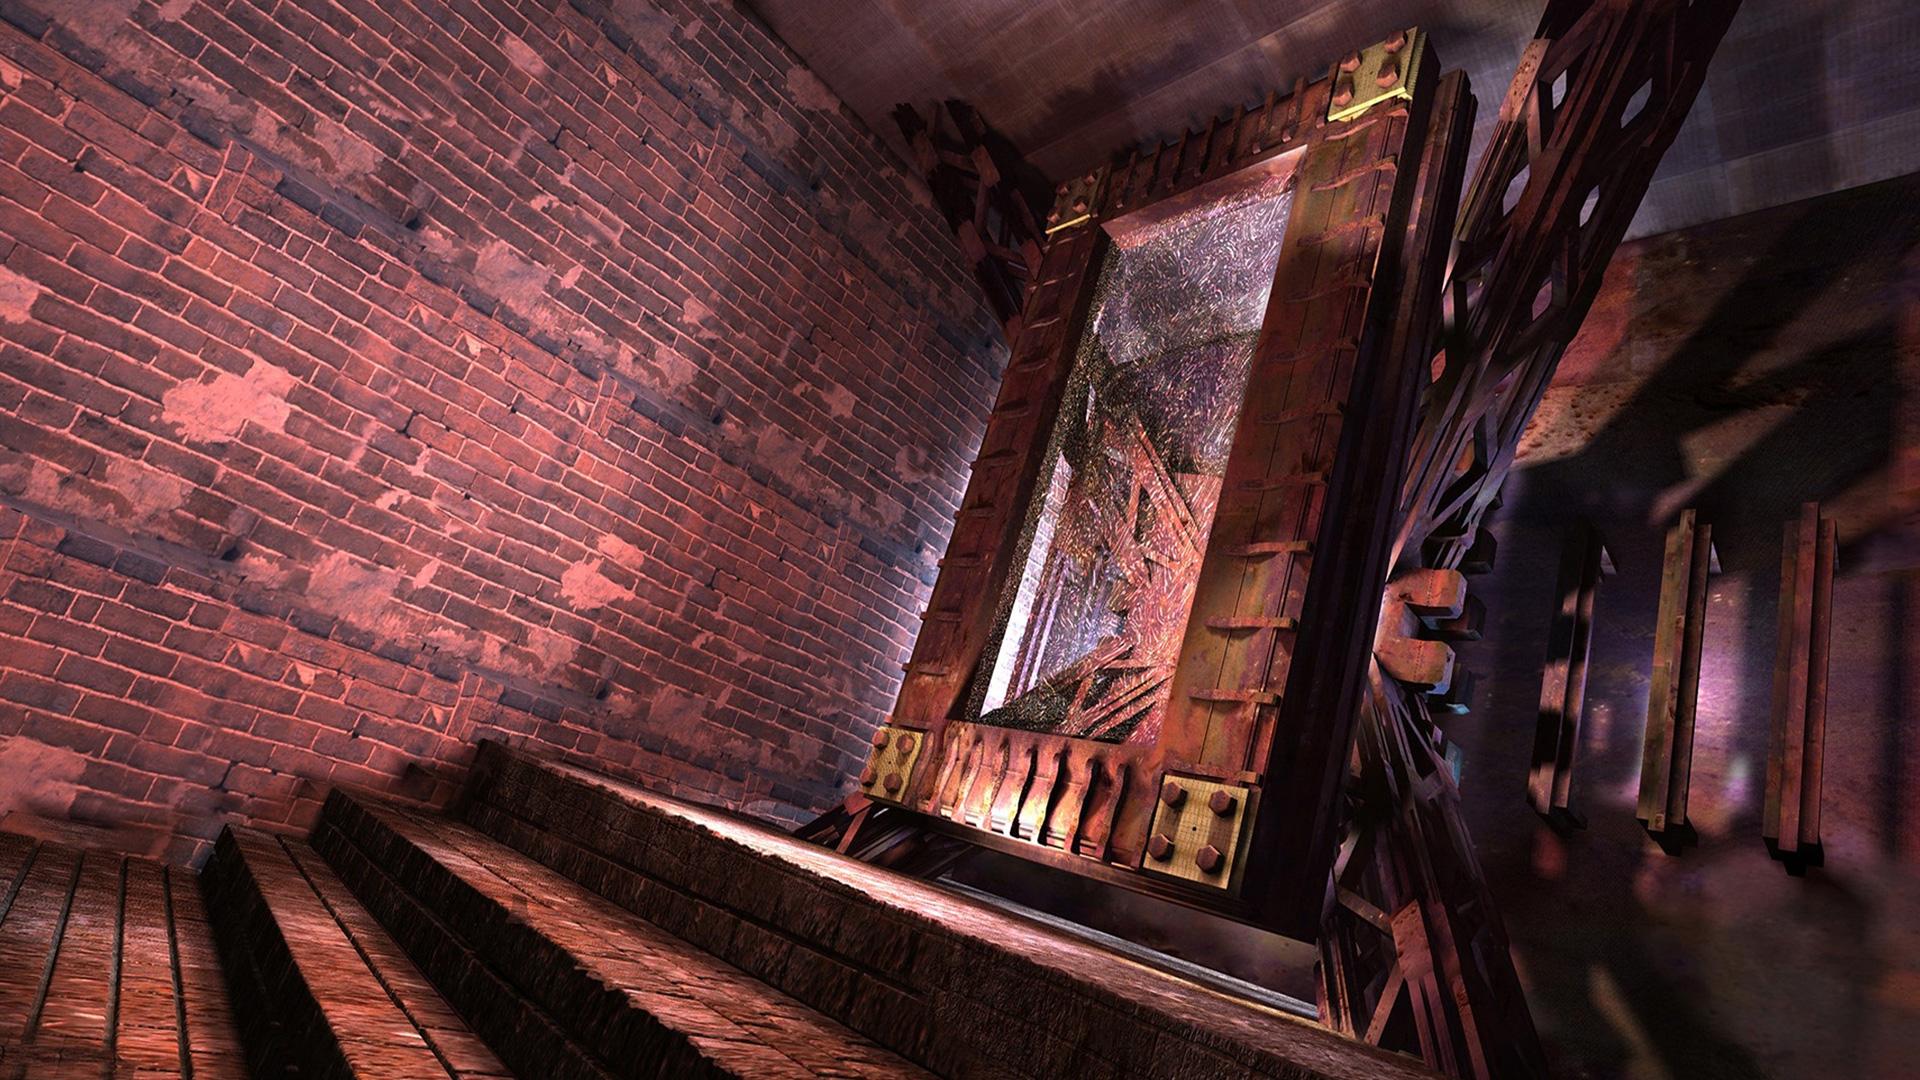 Free Quake III Arena Wallpaper in 1920x1080